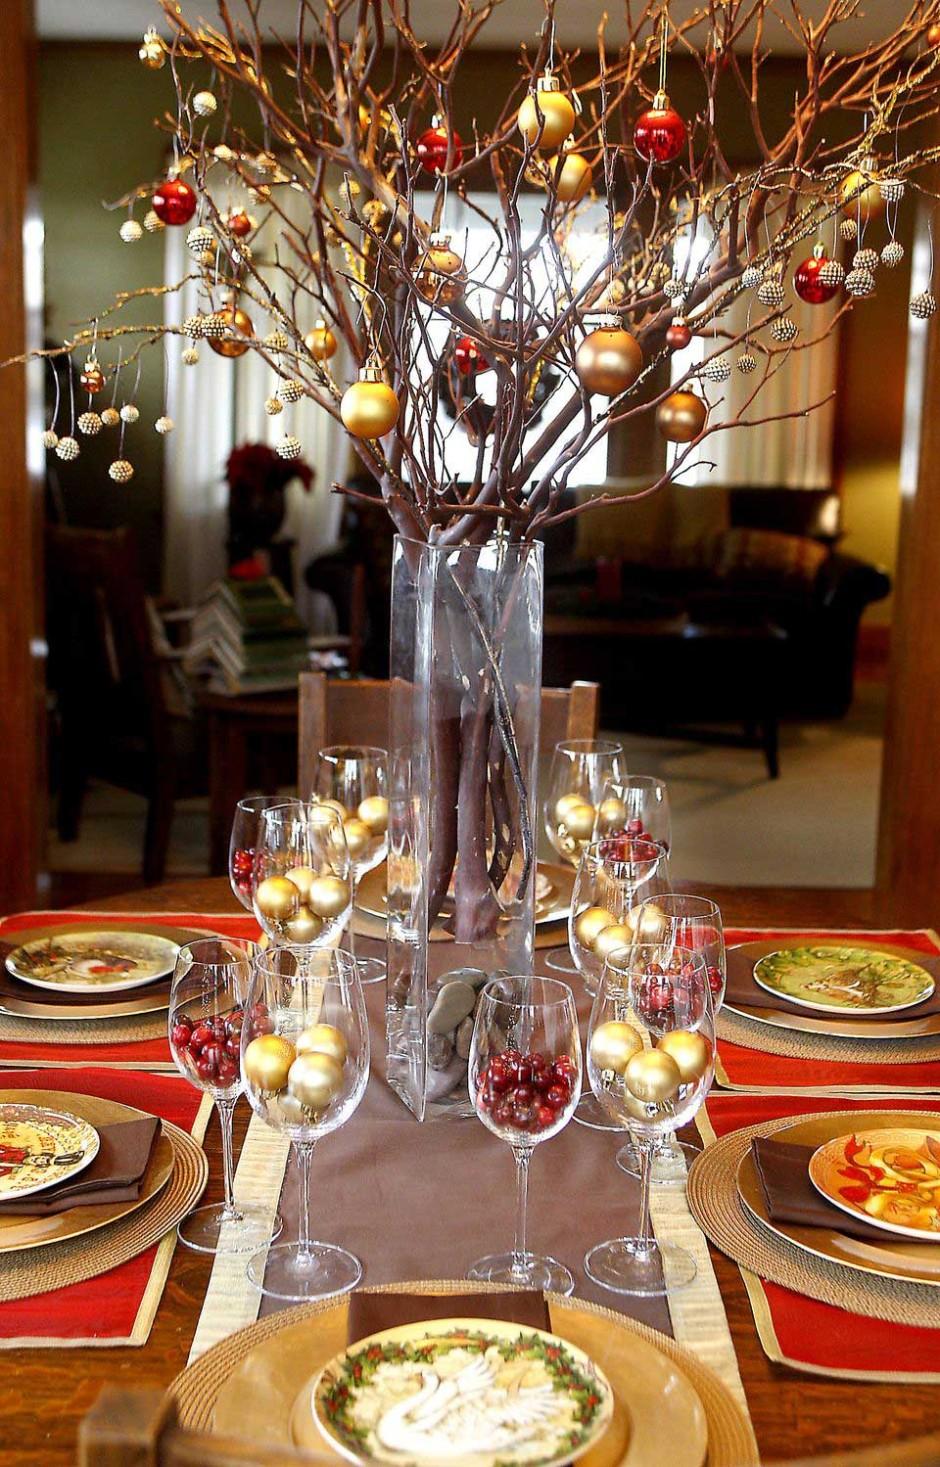 Luxury Christmas Party Centerpiece Idea with Gold Christmas Balls dwellingdecor